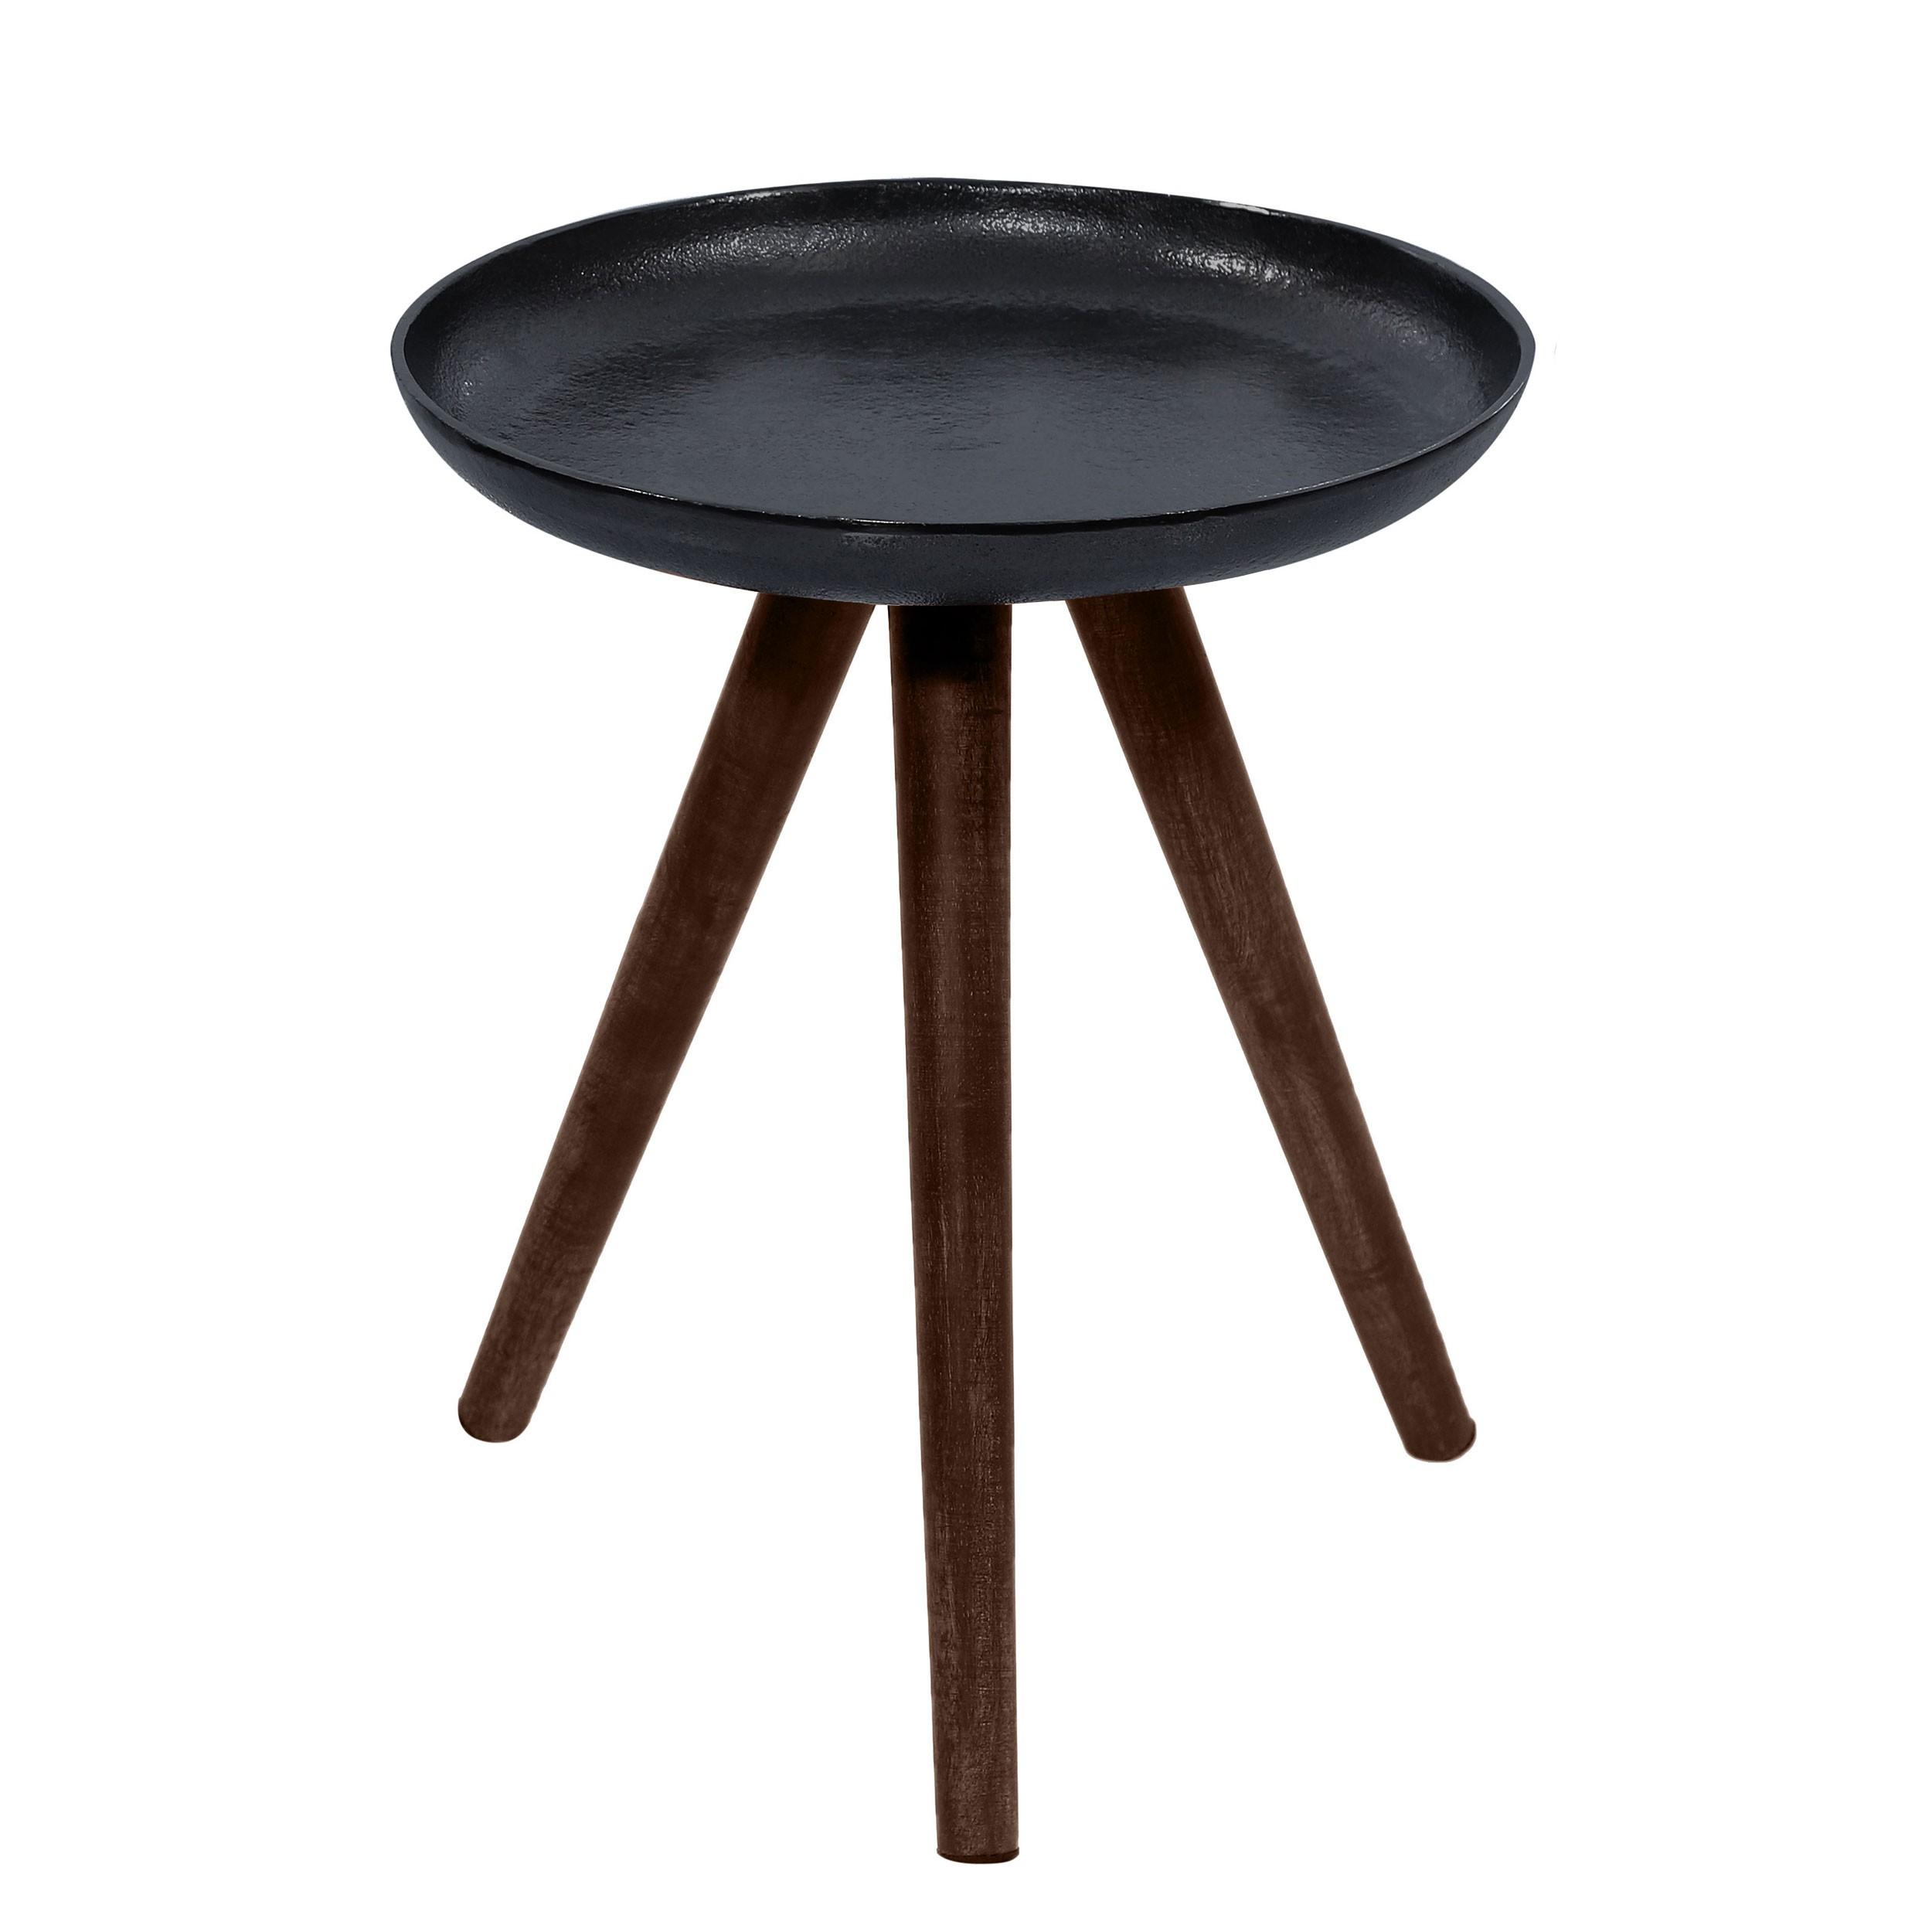 Table basse ronde toluk noire achetez les tables basses for Acheter table ronde